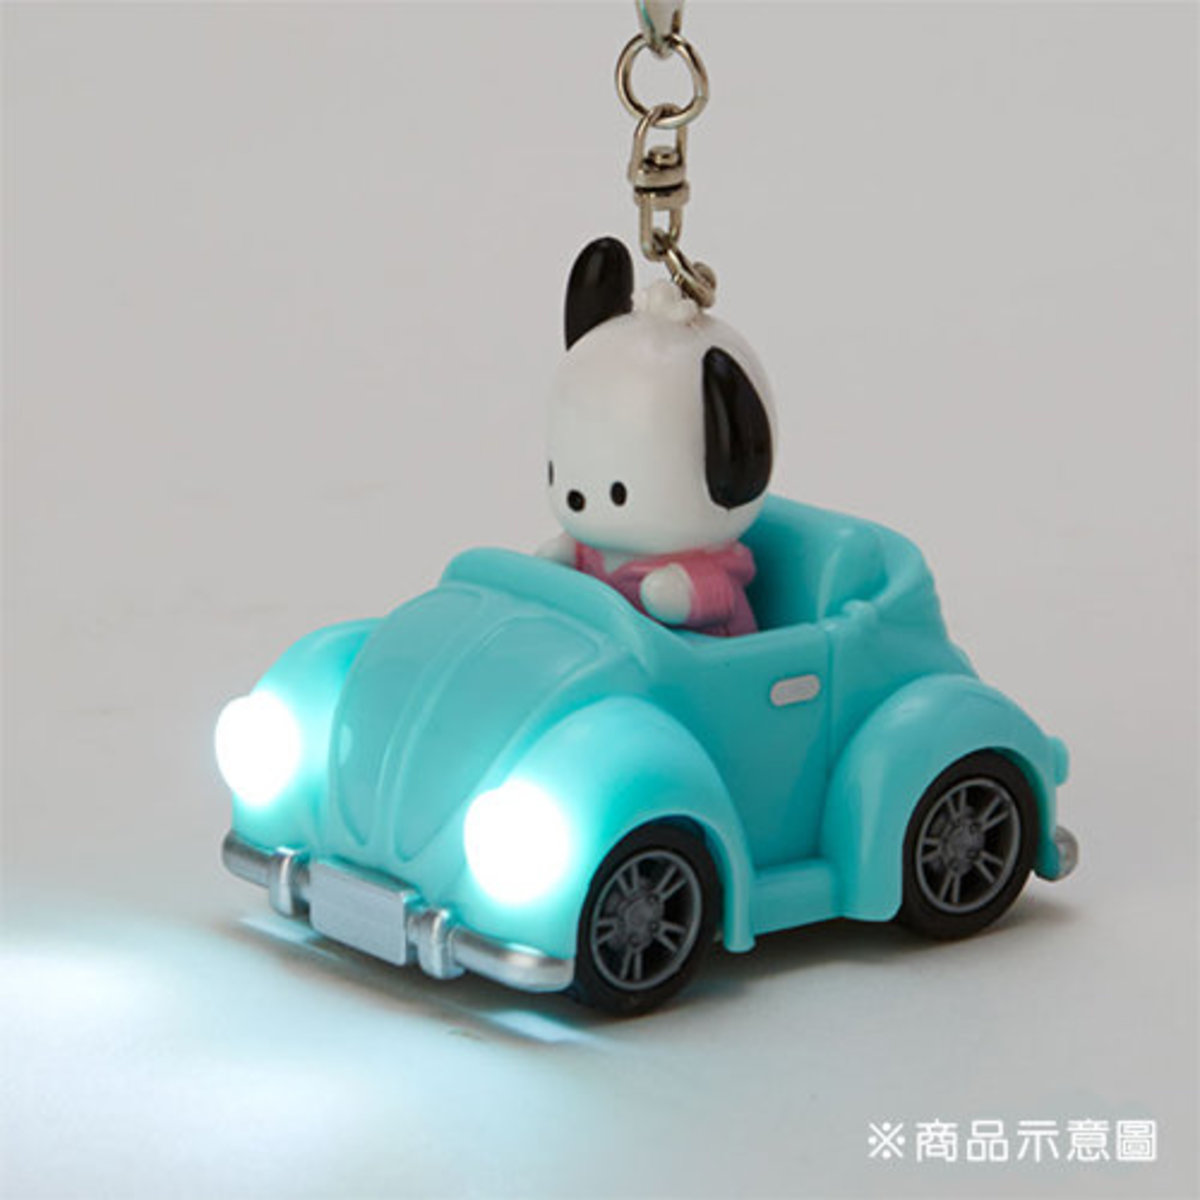 (PC 狗) 日本Sanrio可發光車頭燈鑰匙扣